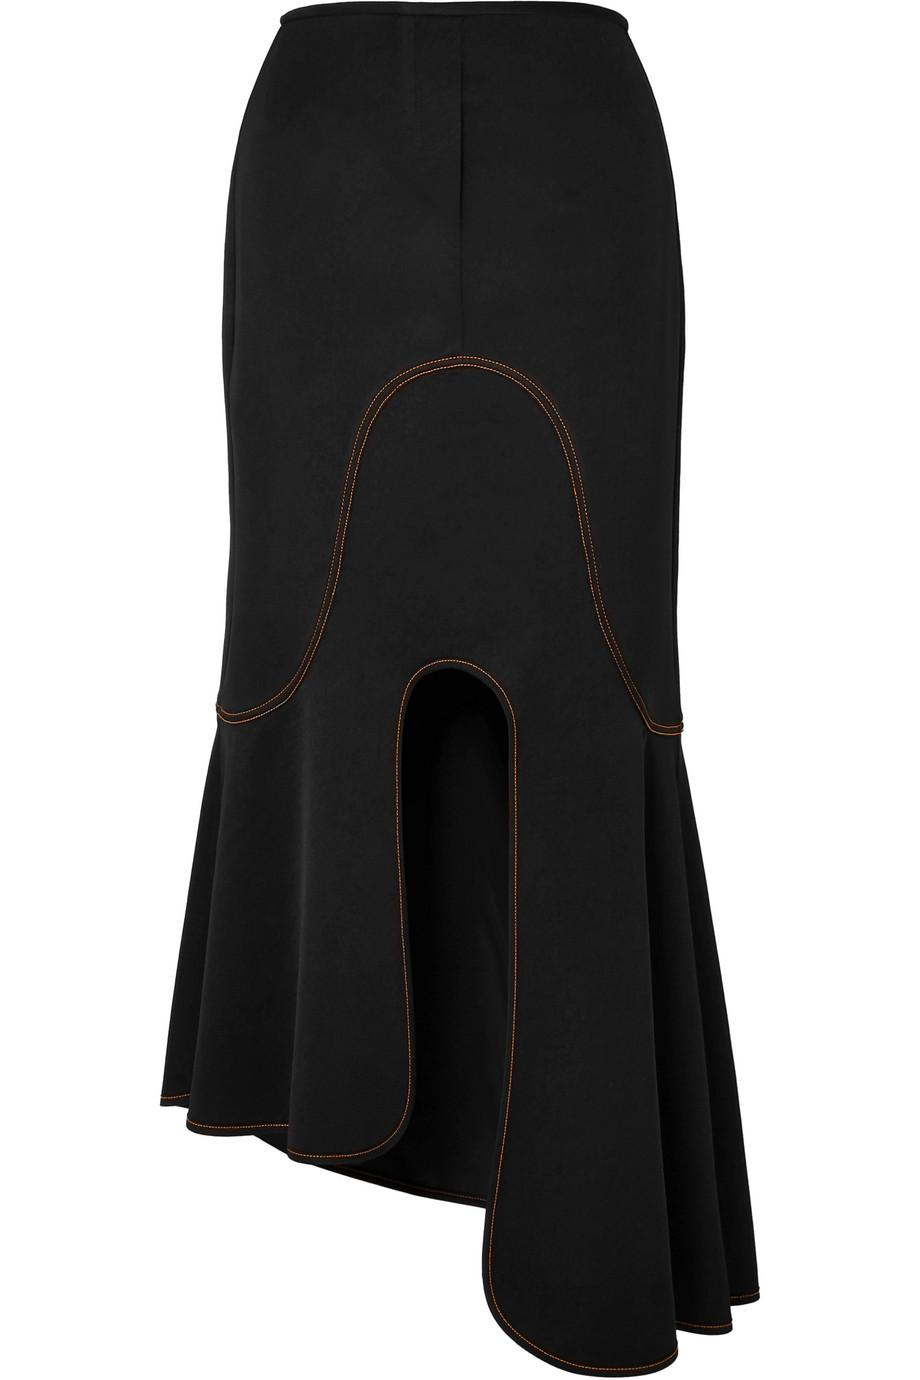 Sale Authentic Dasha Striped Ribbed-knit Midi Skirt - Black Ellery New Styles Cheap Price Buy Cheap The Cheapest hhKfuMJ